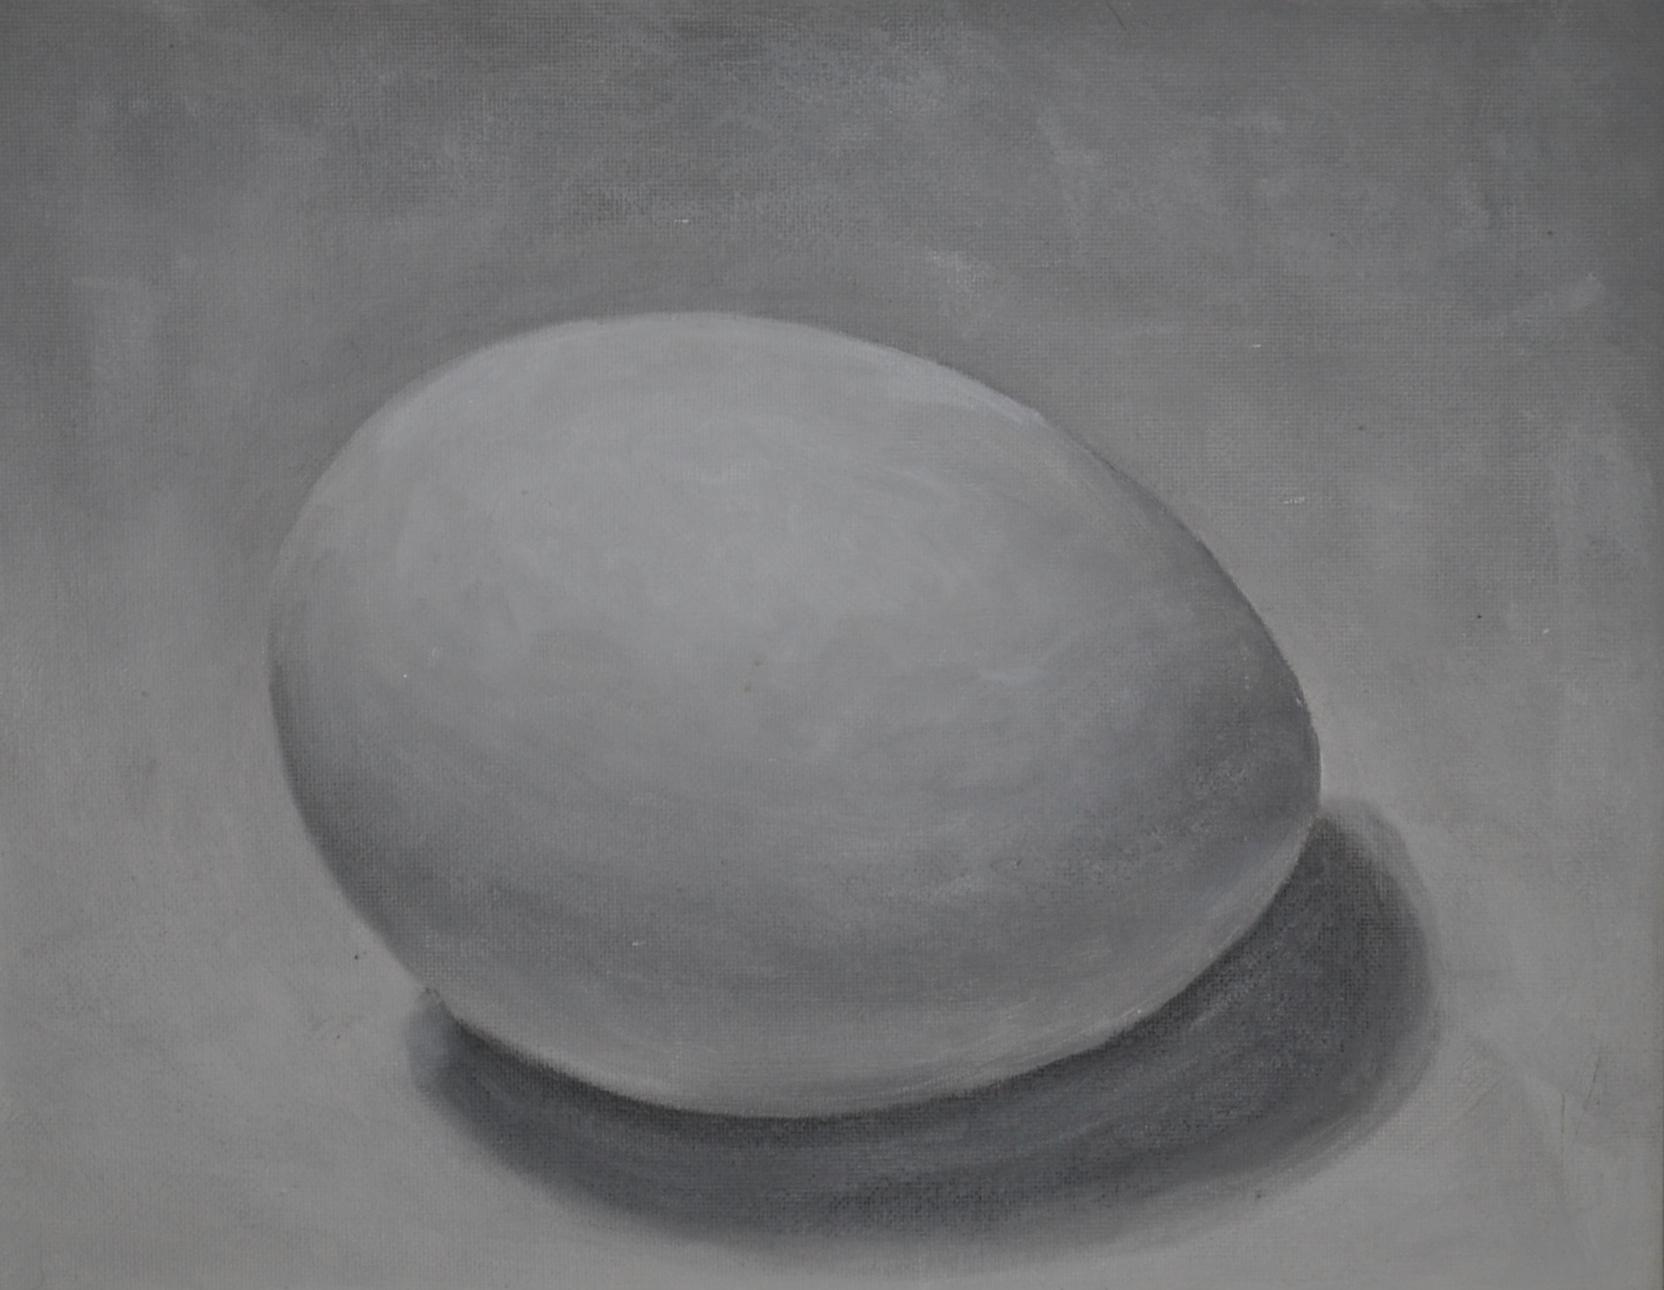 Lone egg f1rdr5